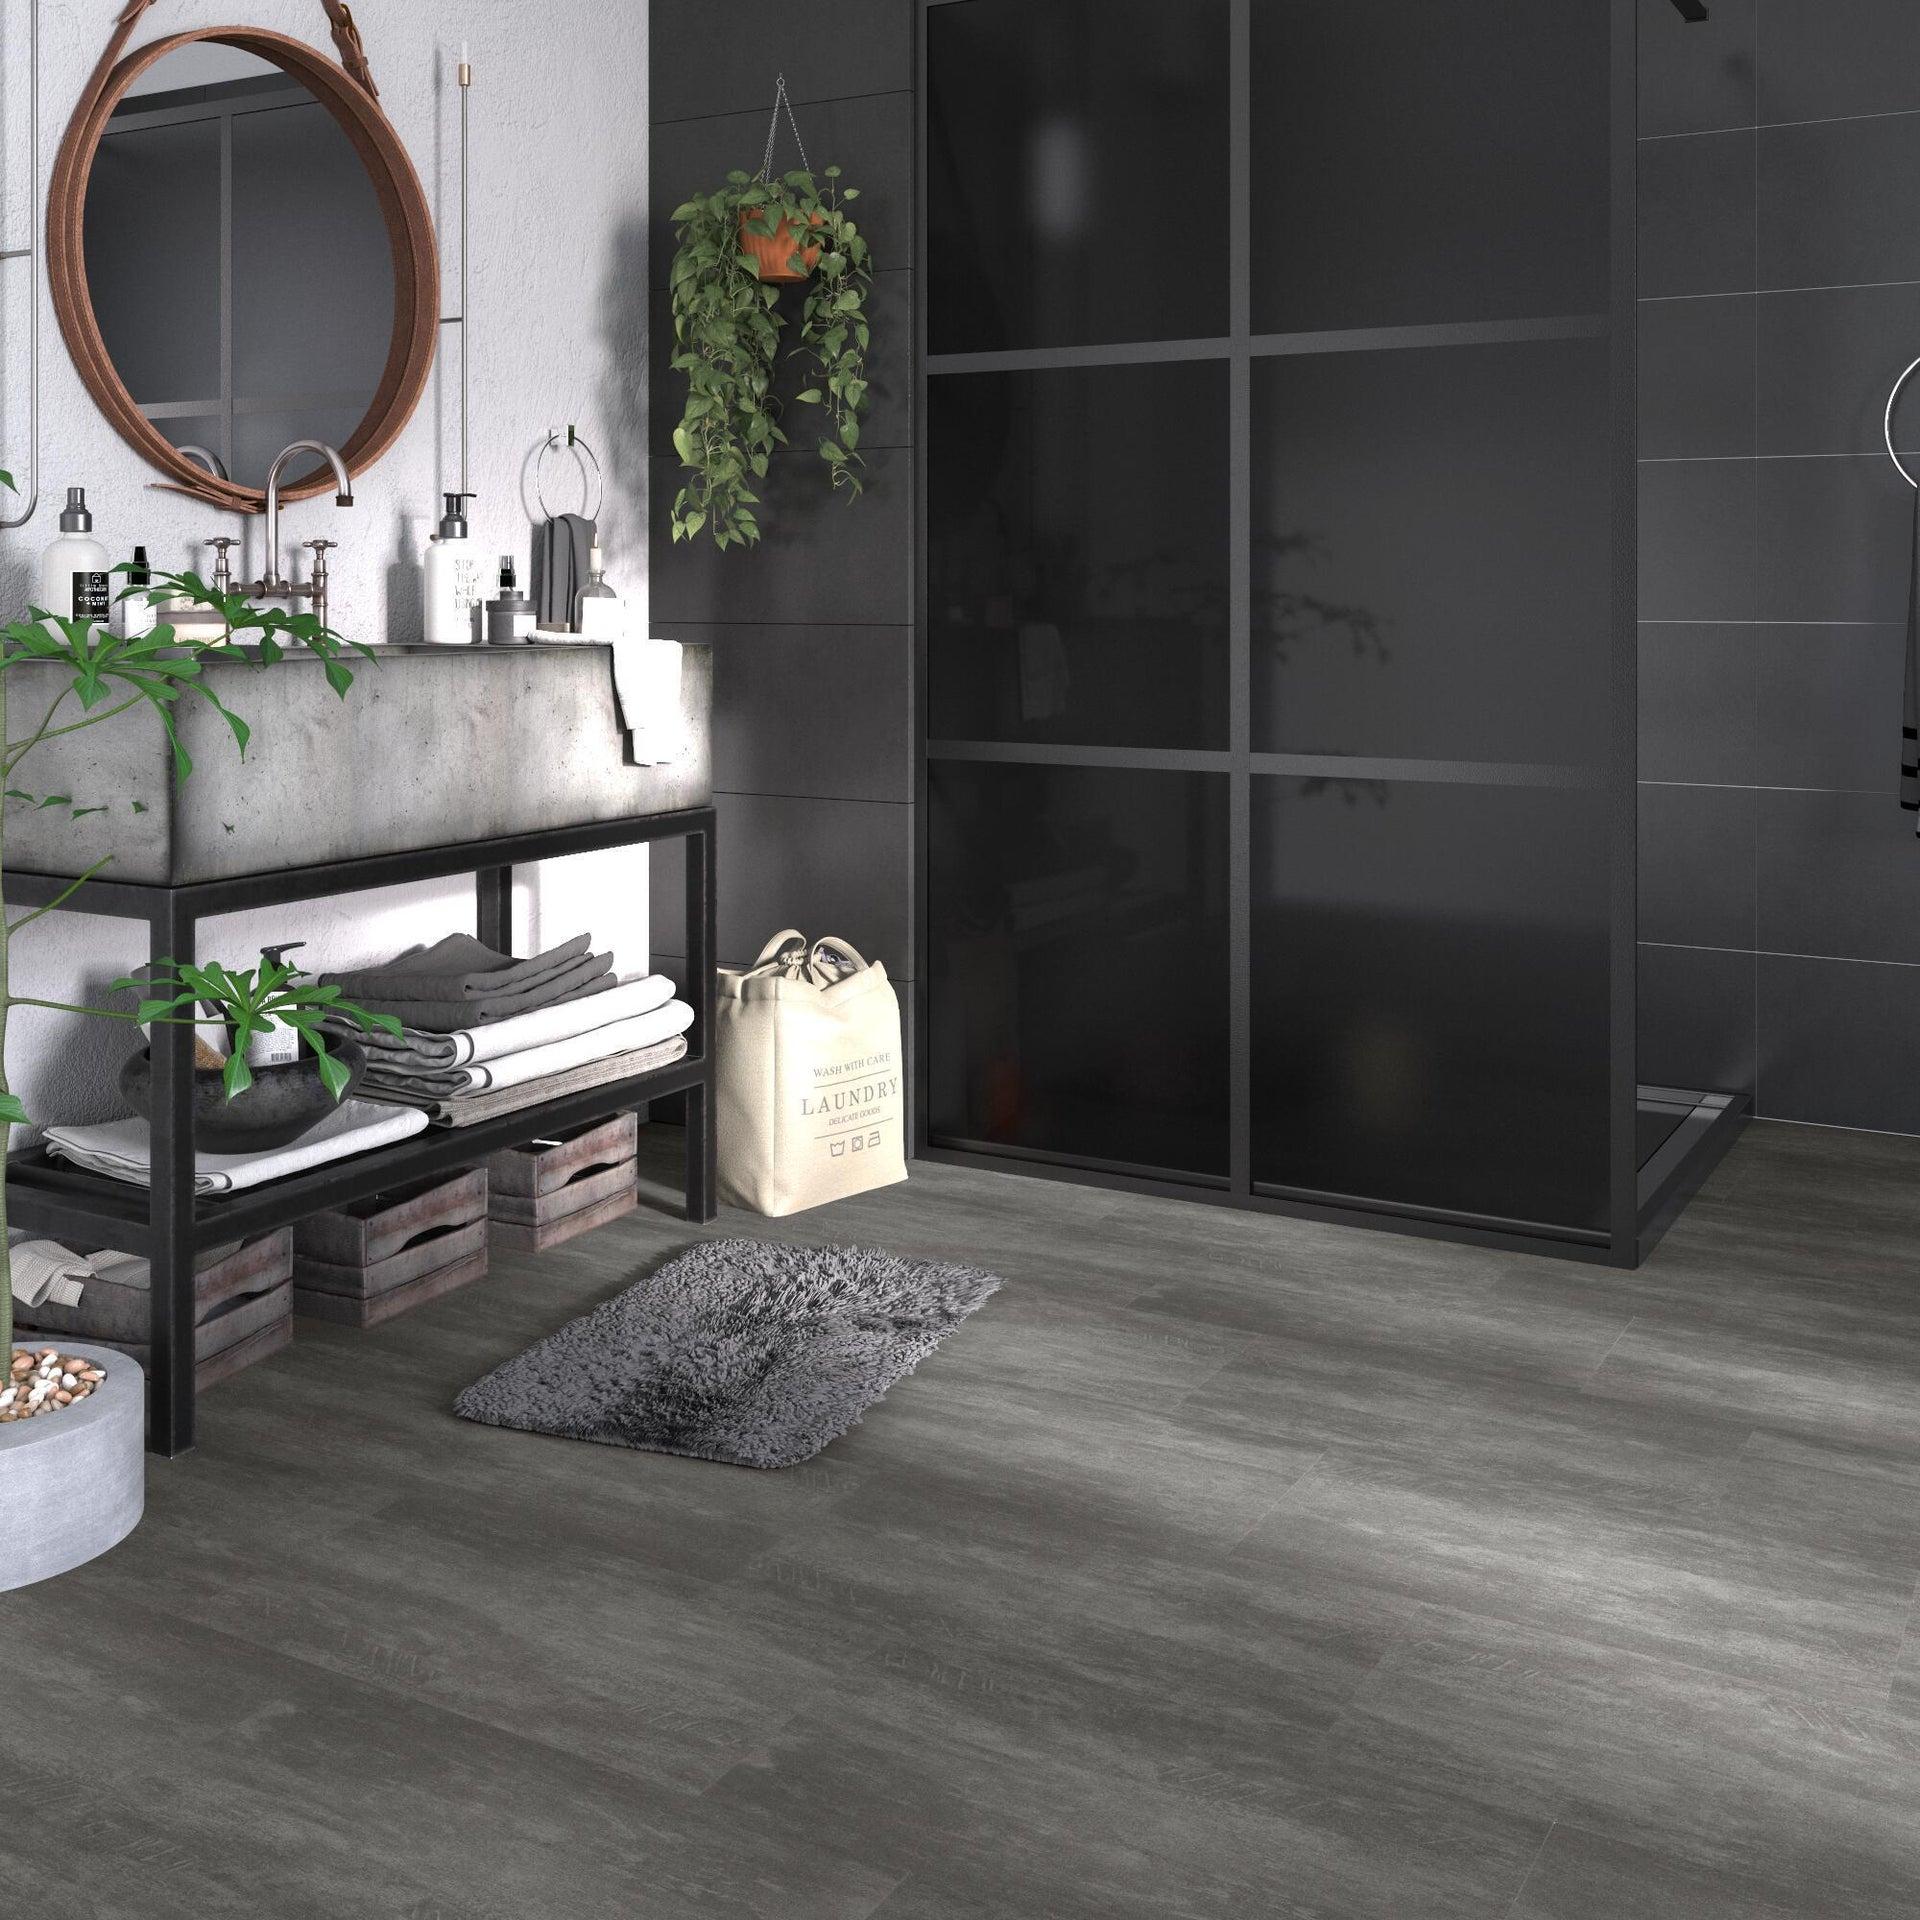 Pavimento PVC incastro Tolu Sp 4 mm grigio / argento - 19